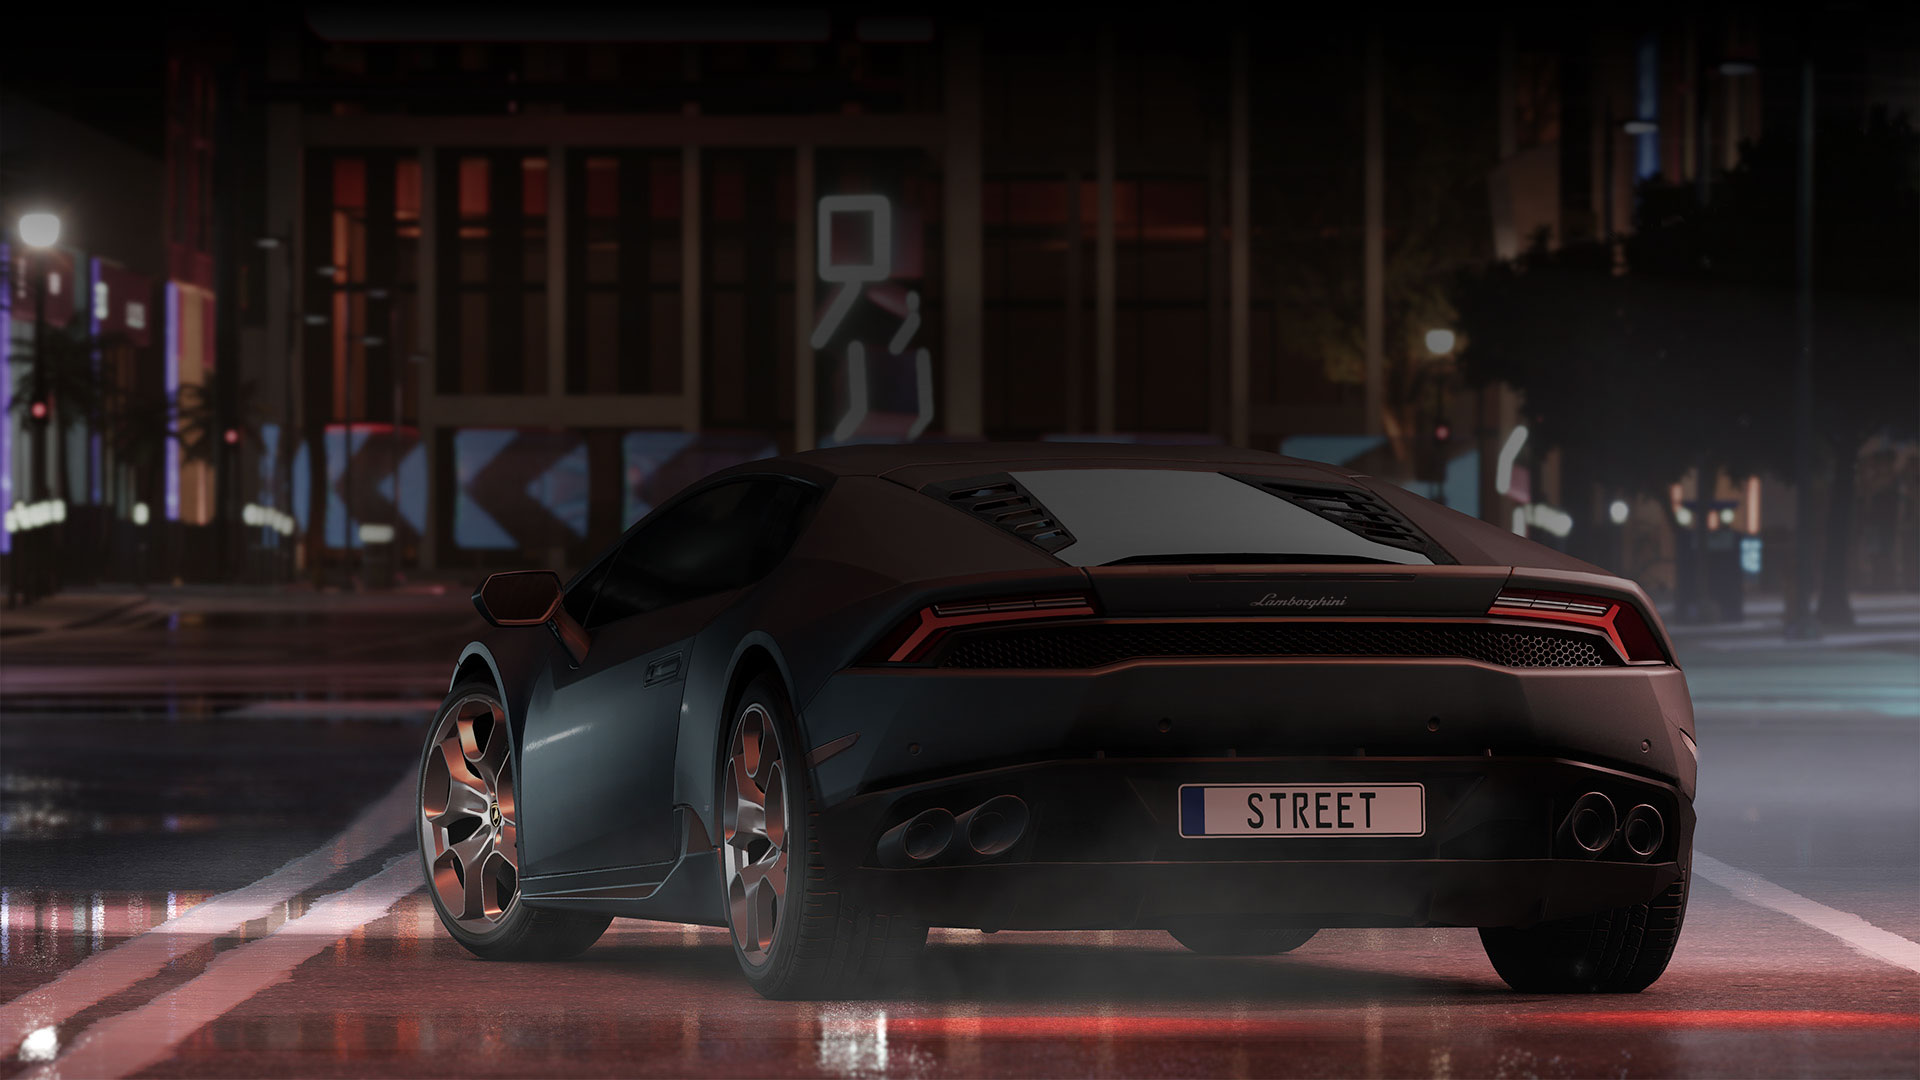 Black Lamborghini Huracan on a street